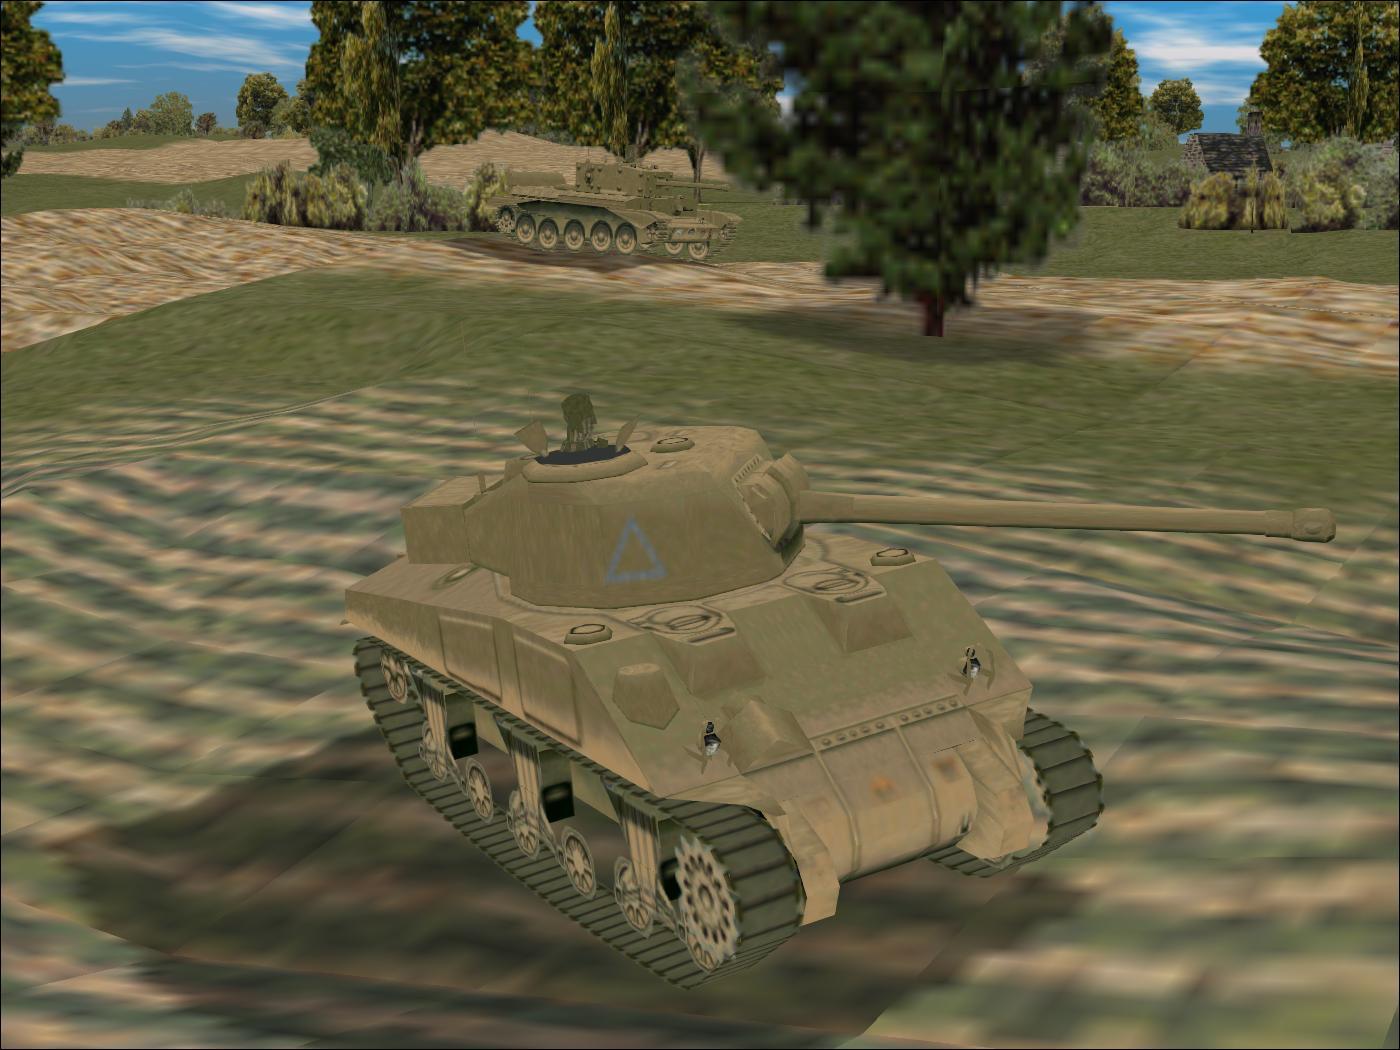 Panzer Elite Brit44-x beta - Sherman Firefly & Cromwell, Normandy